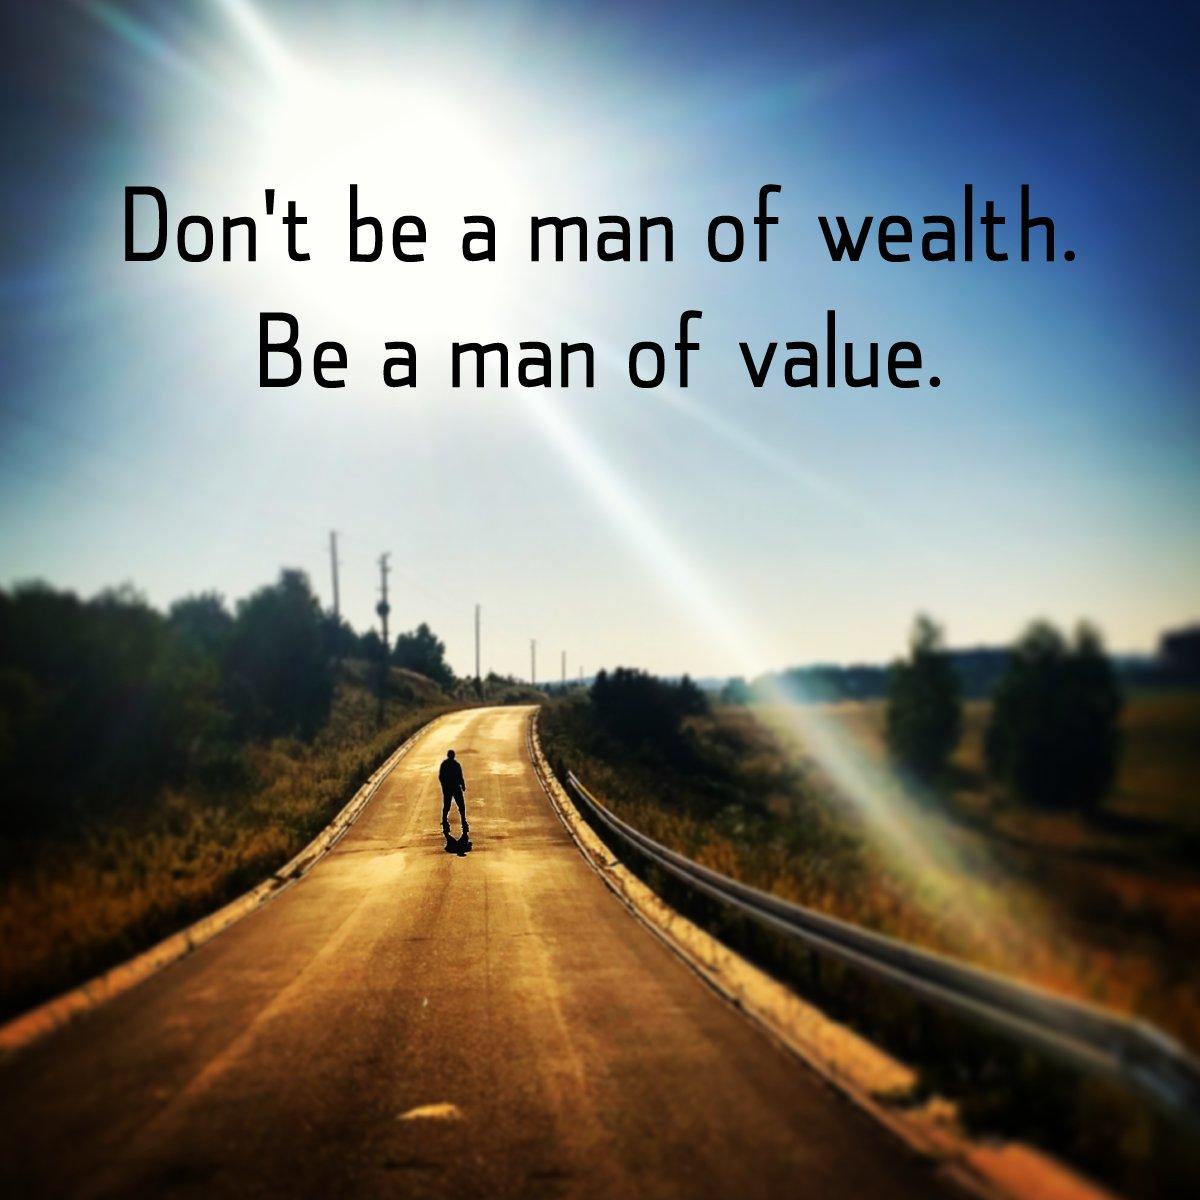 Be a man of value! #Men #Style https://t.co/Ev7IUkrcsH